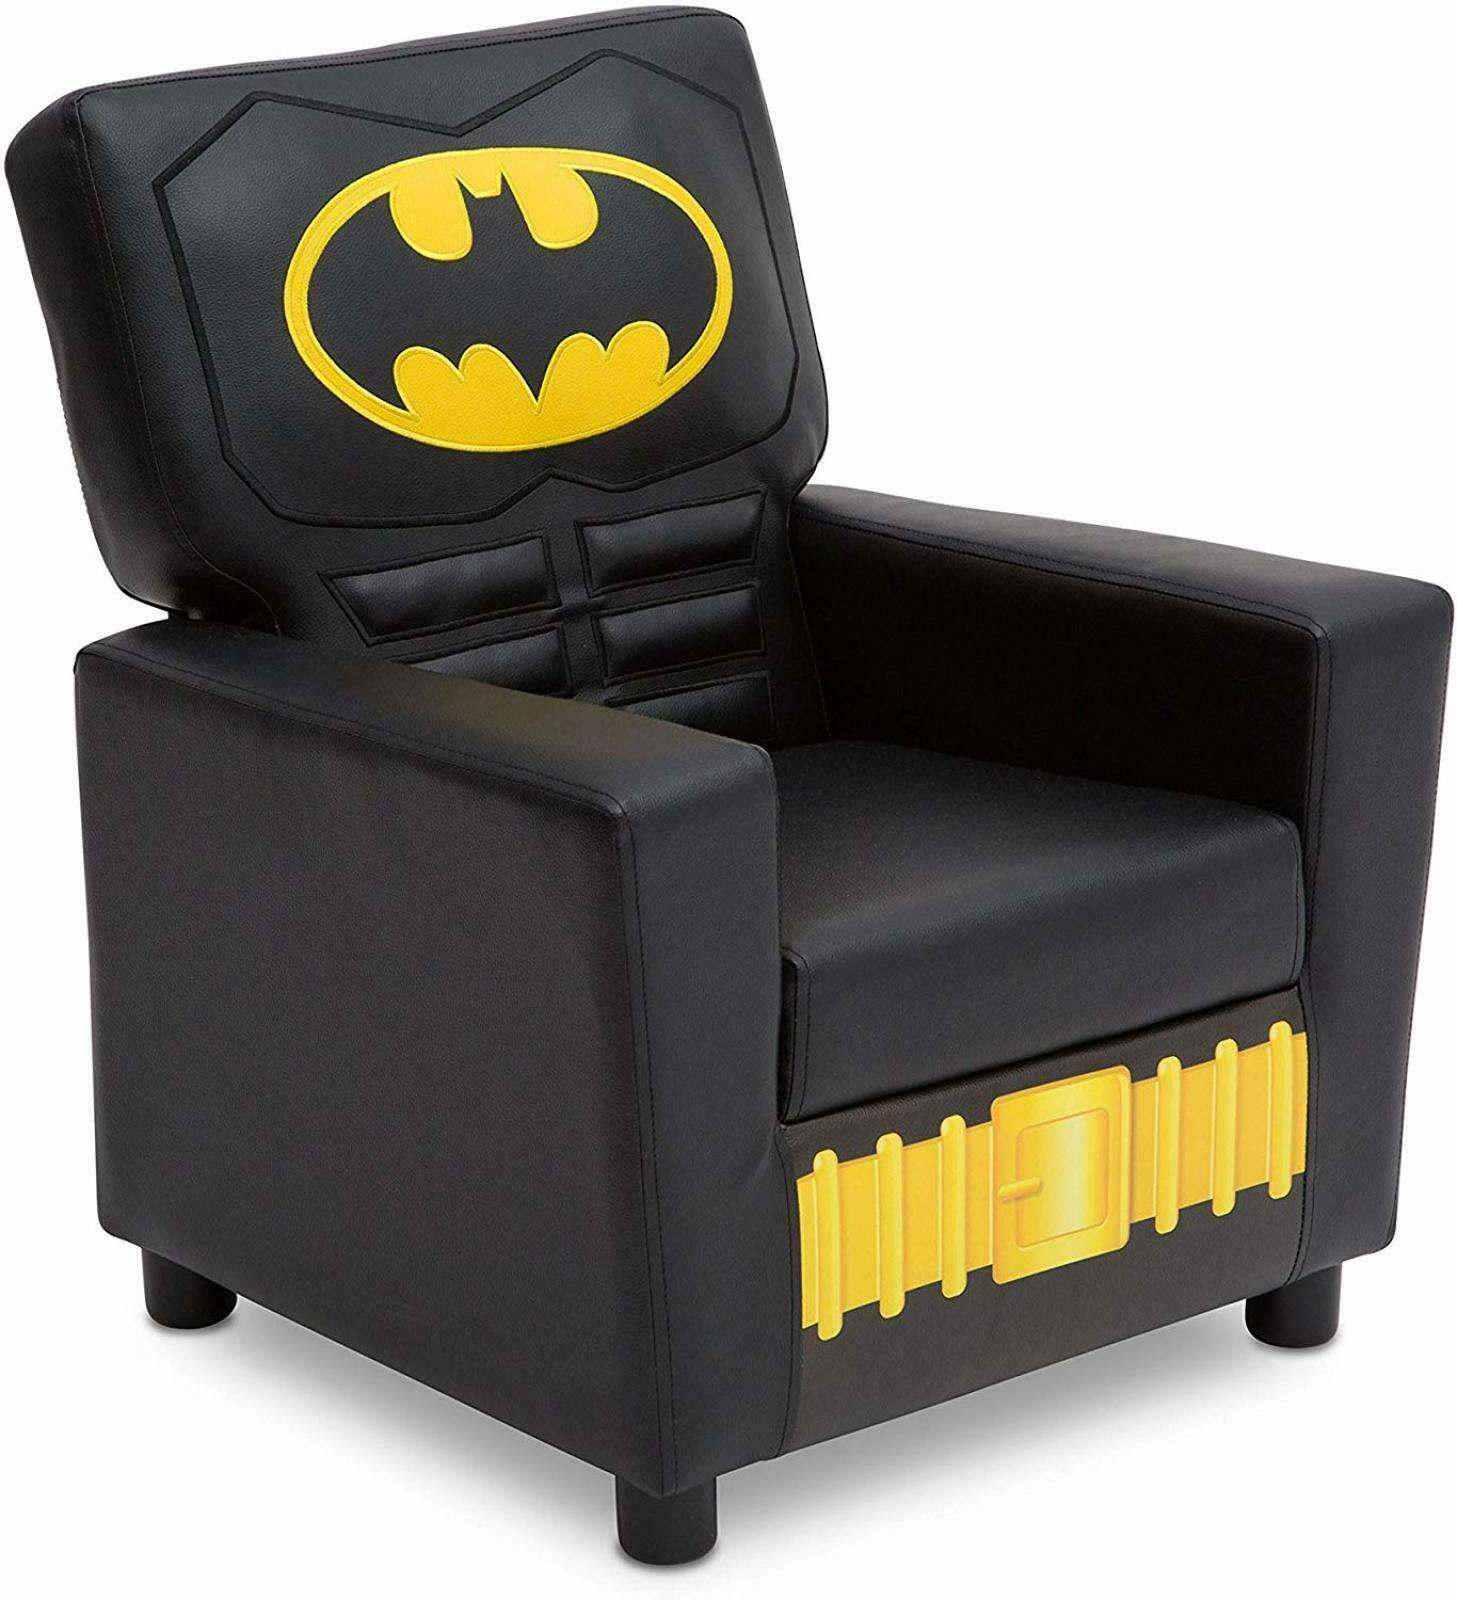 Toddler Chair Couch Batman Furniture Kids Bedroom Decor Dc Comics Super Hero Ebay